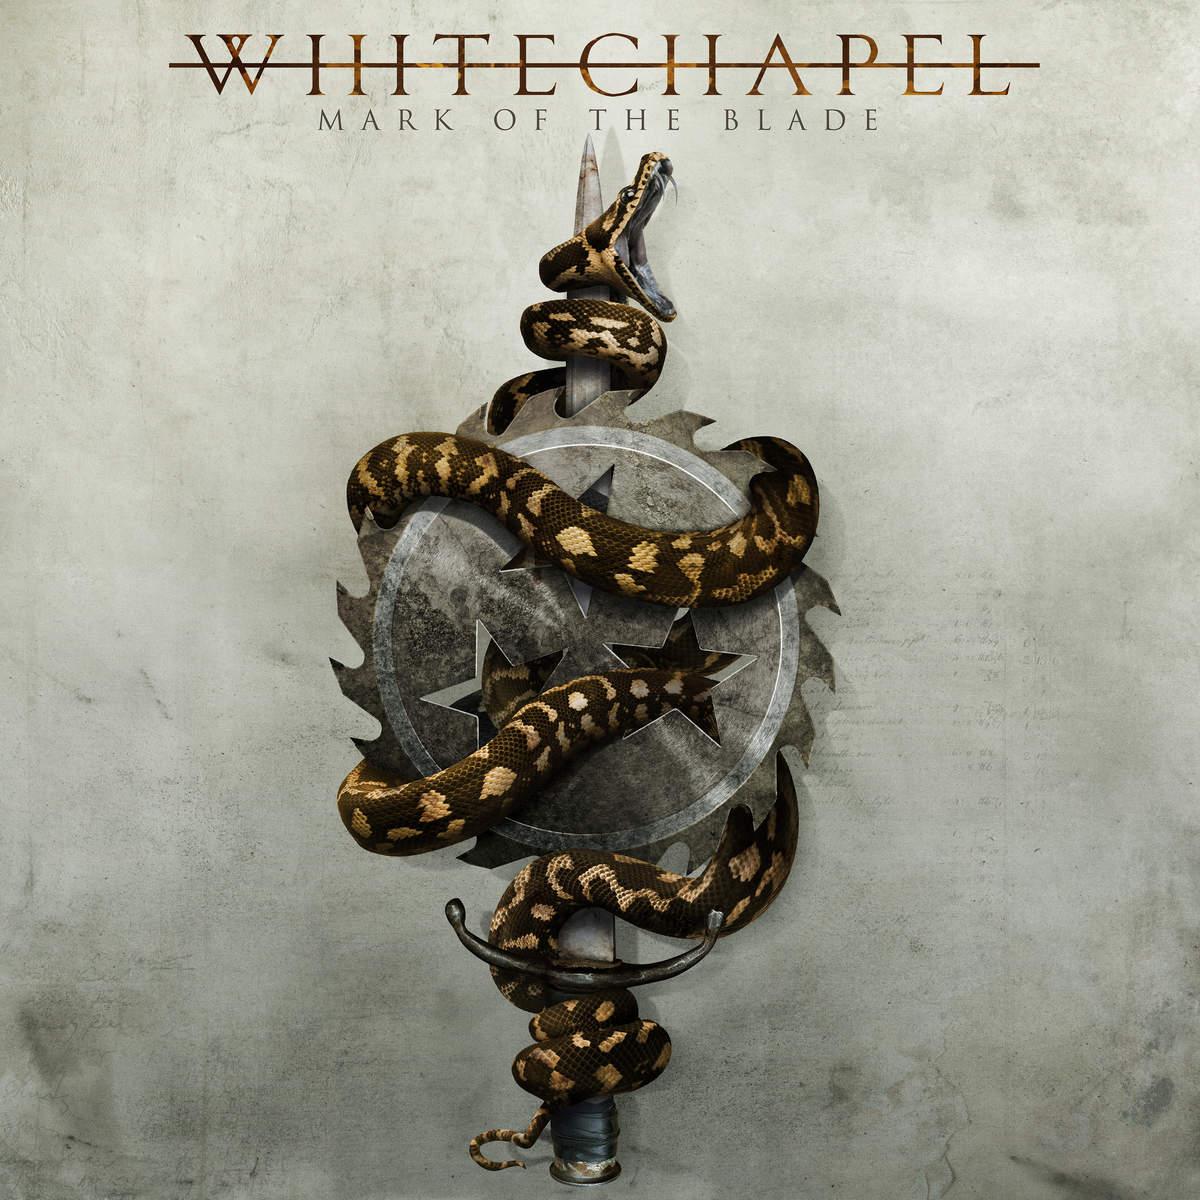 Whitechapel mark of the blade cover